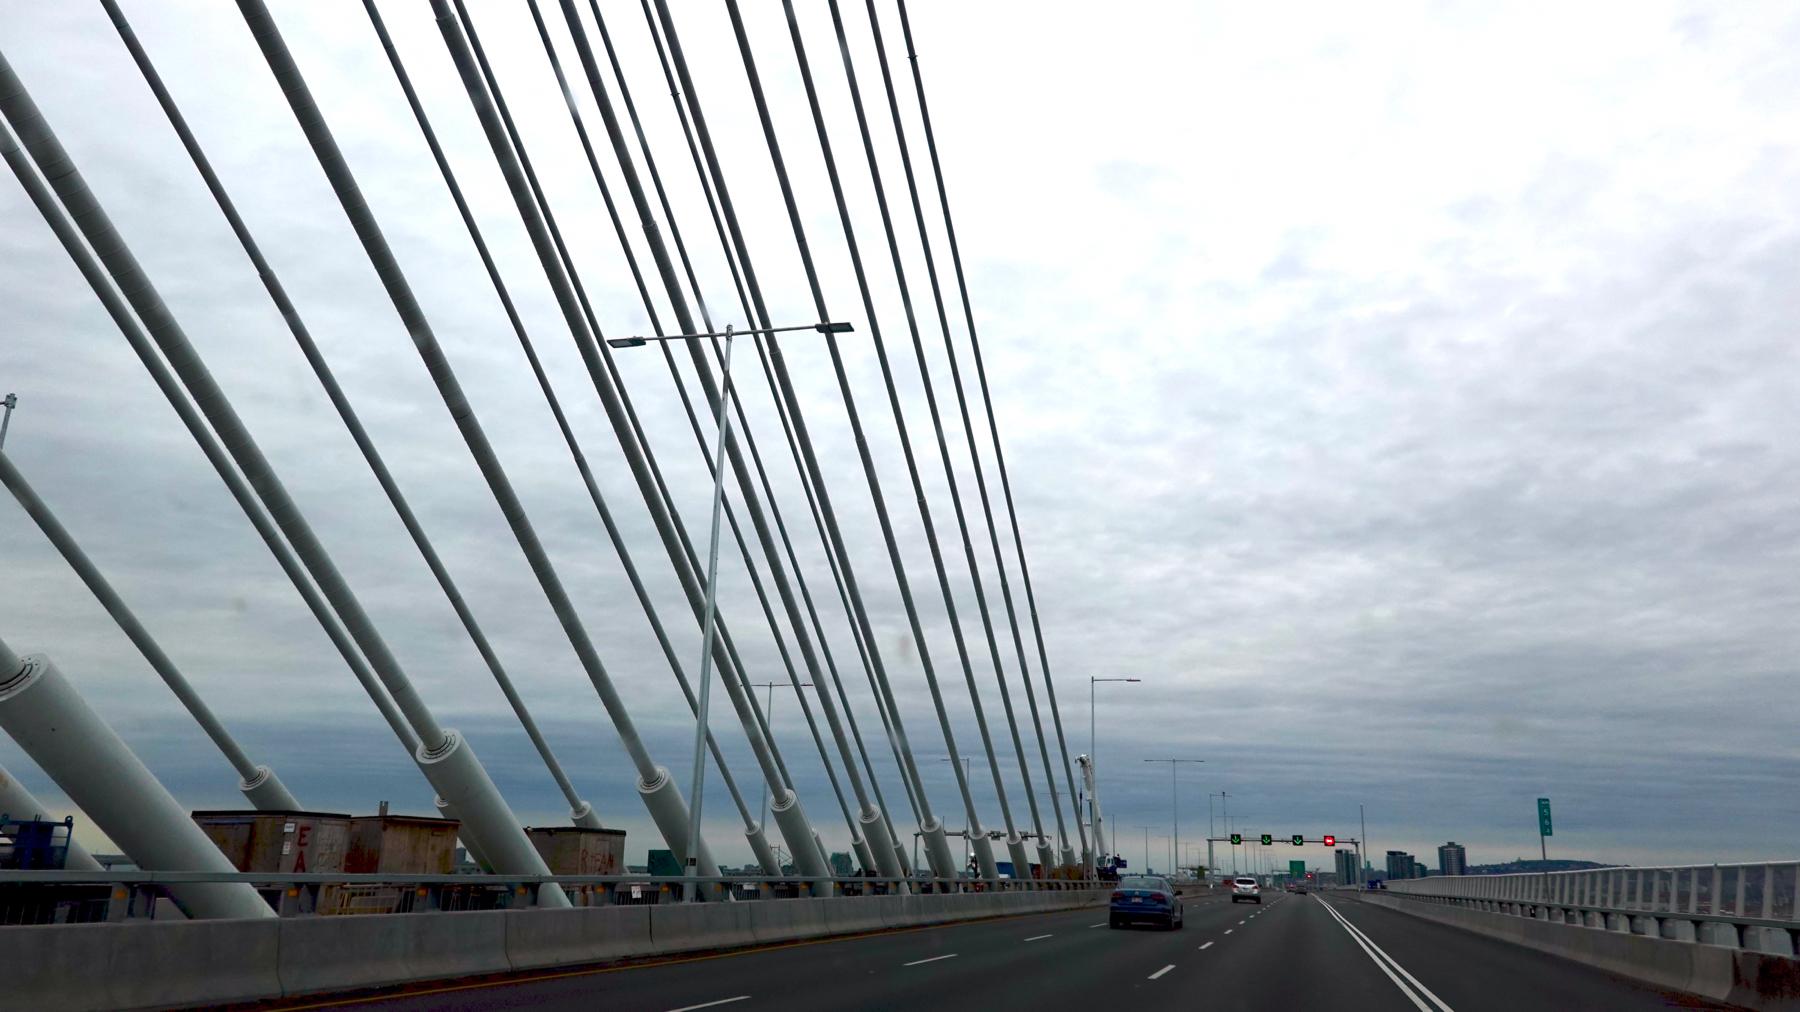 Many bridges